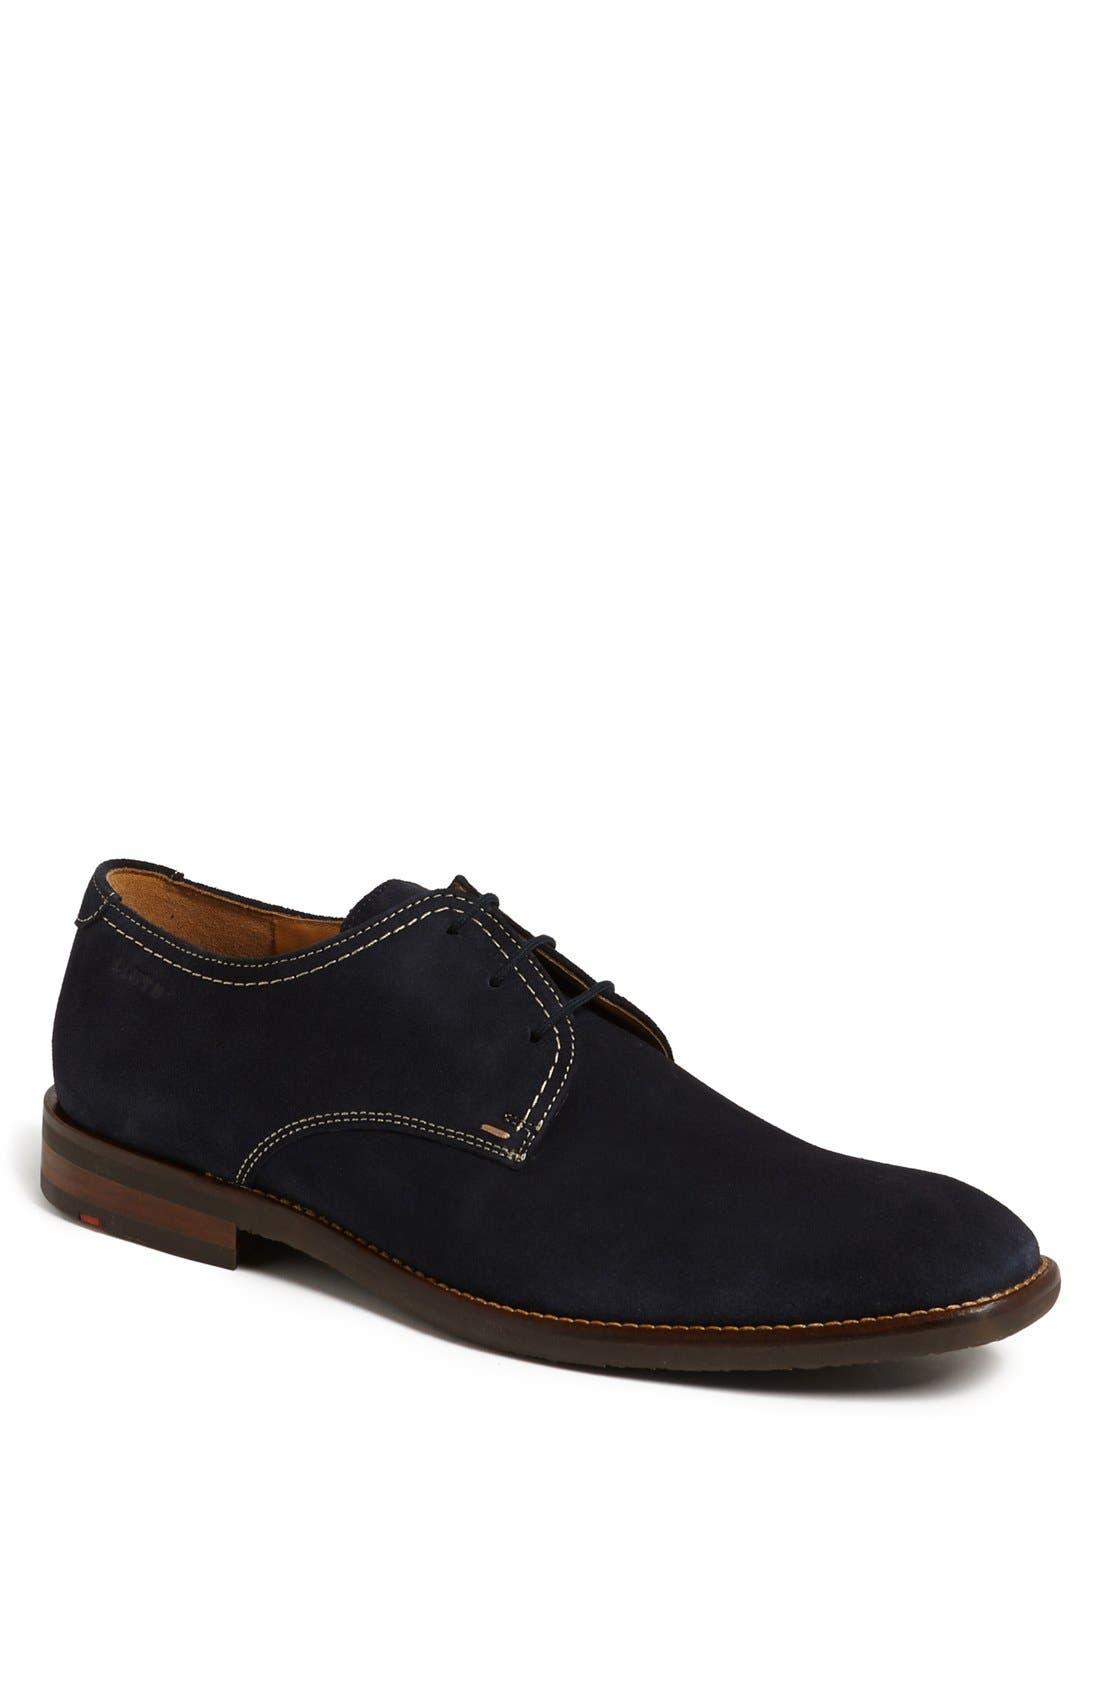 Alternate Image 1 Selected - Lloyd 'Hel' Buck Shoe